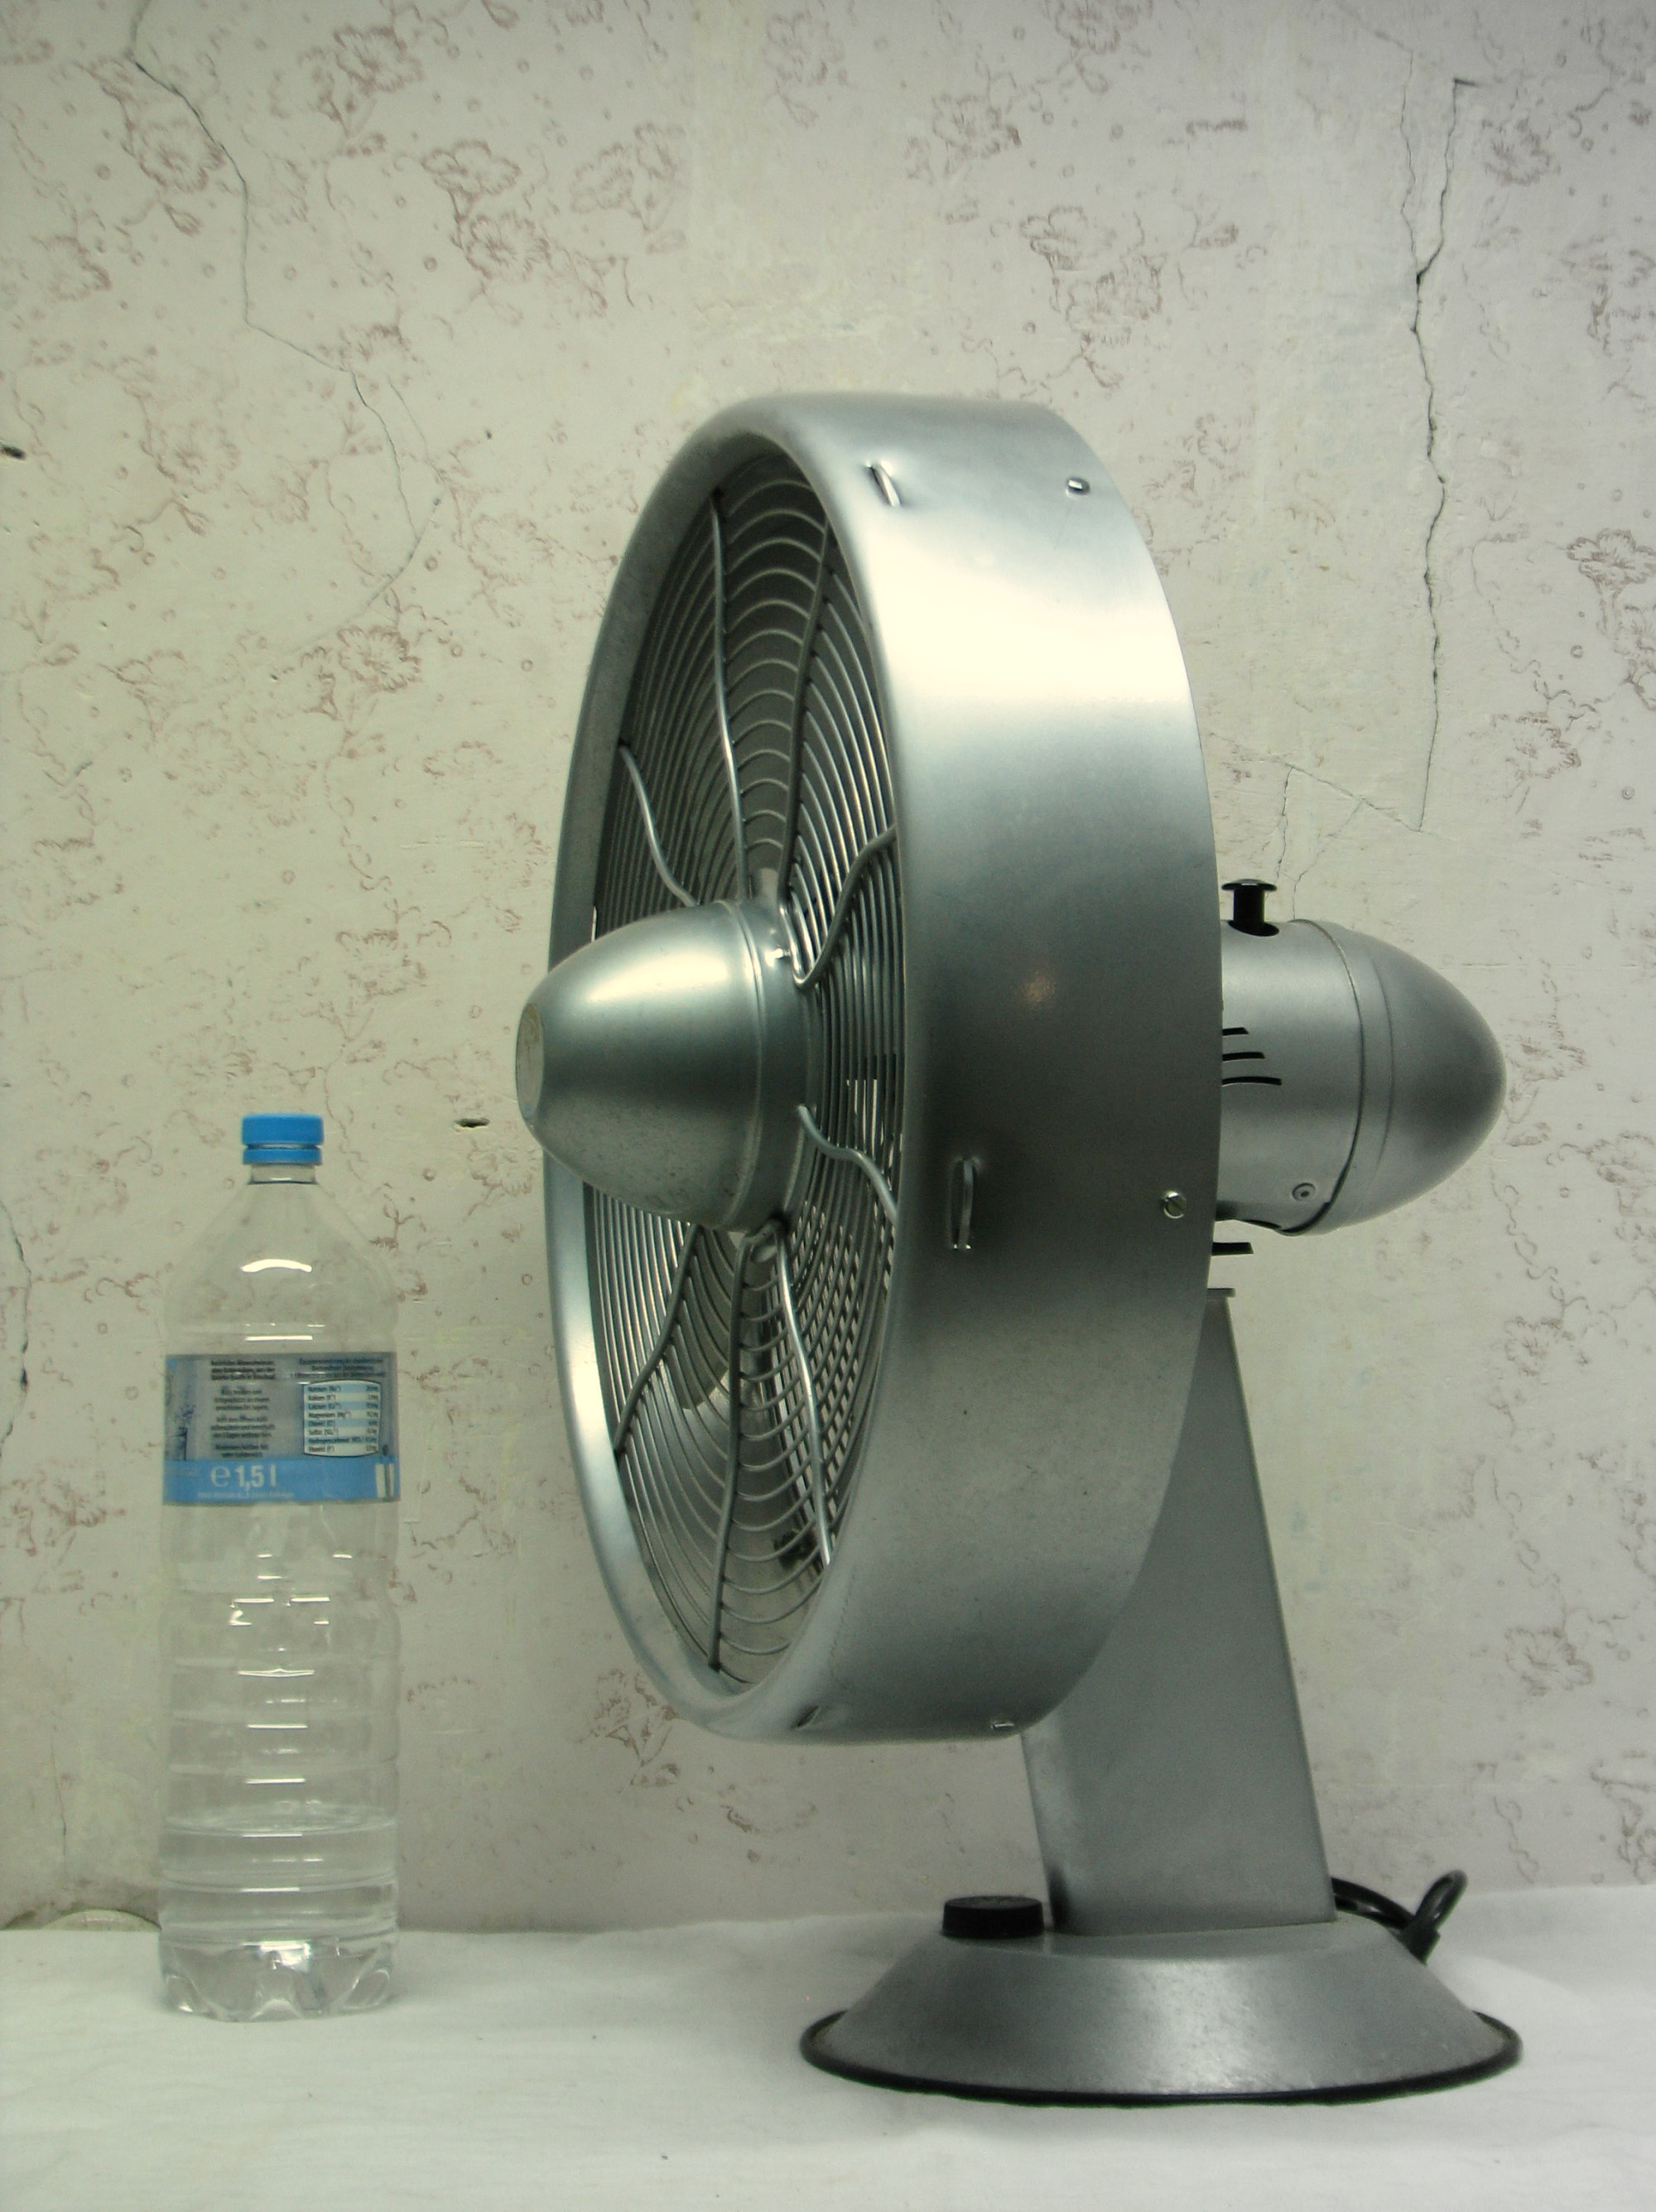 Ventilator 56 cm design streamline fan usa machine age for Design tischventilator